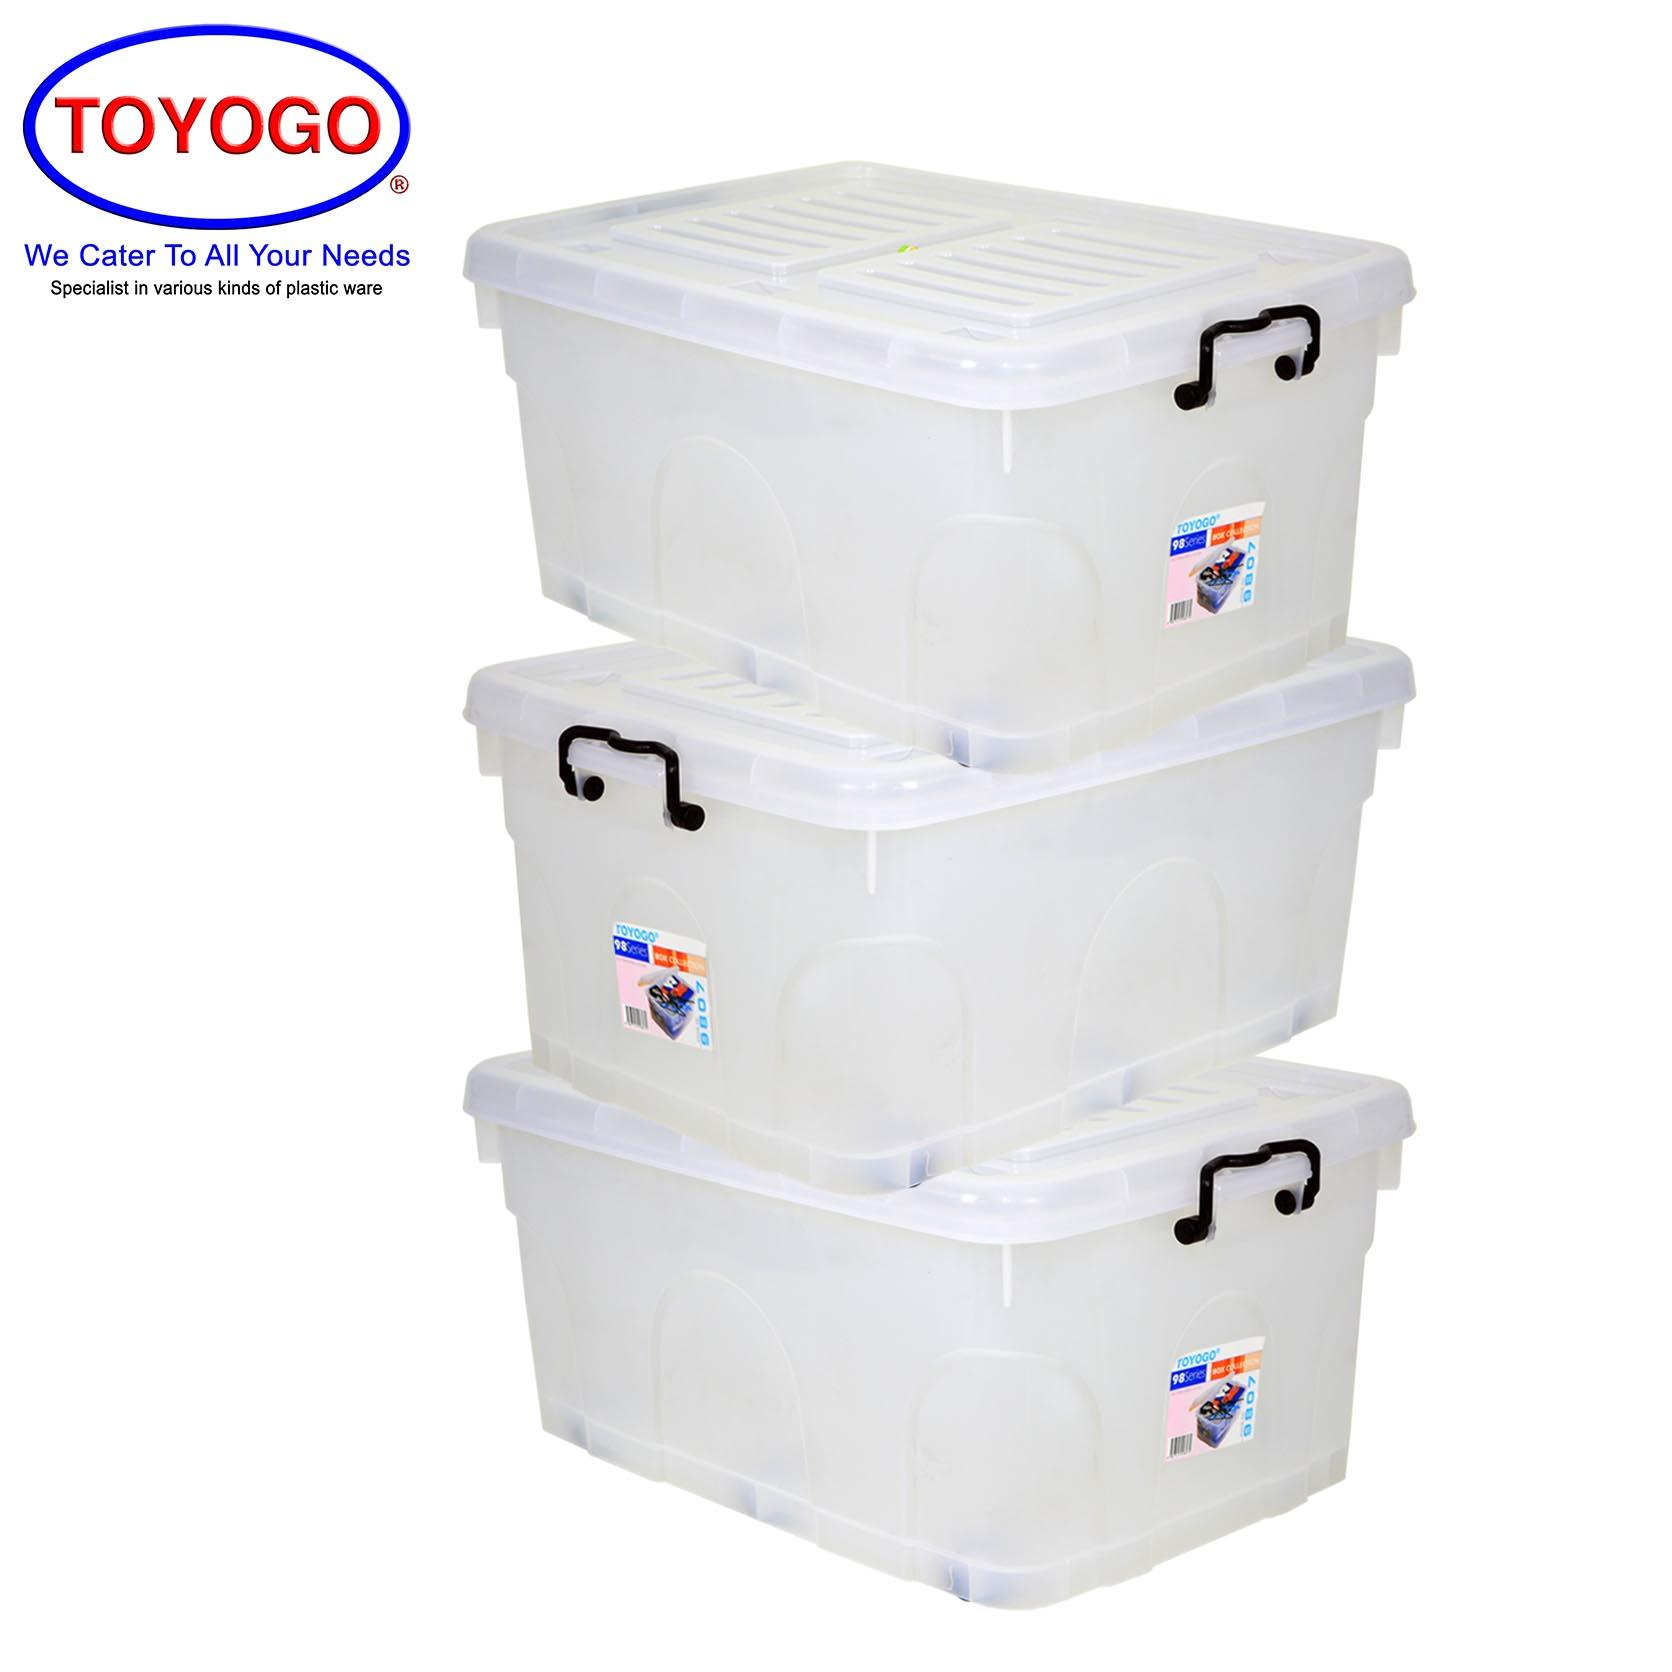 Toyogo Storage Box With Wheels (Bundle of 3) (9807)